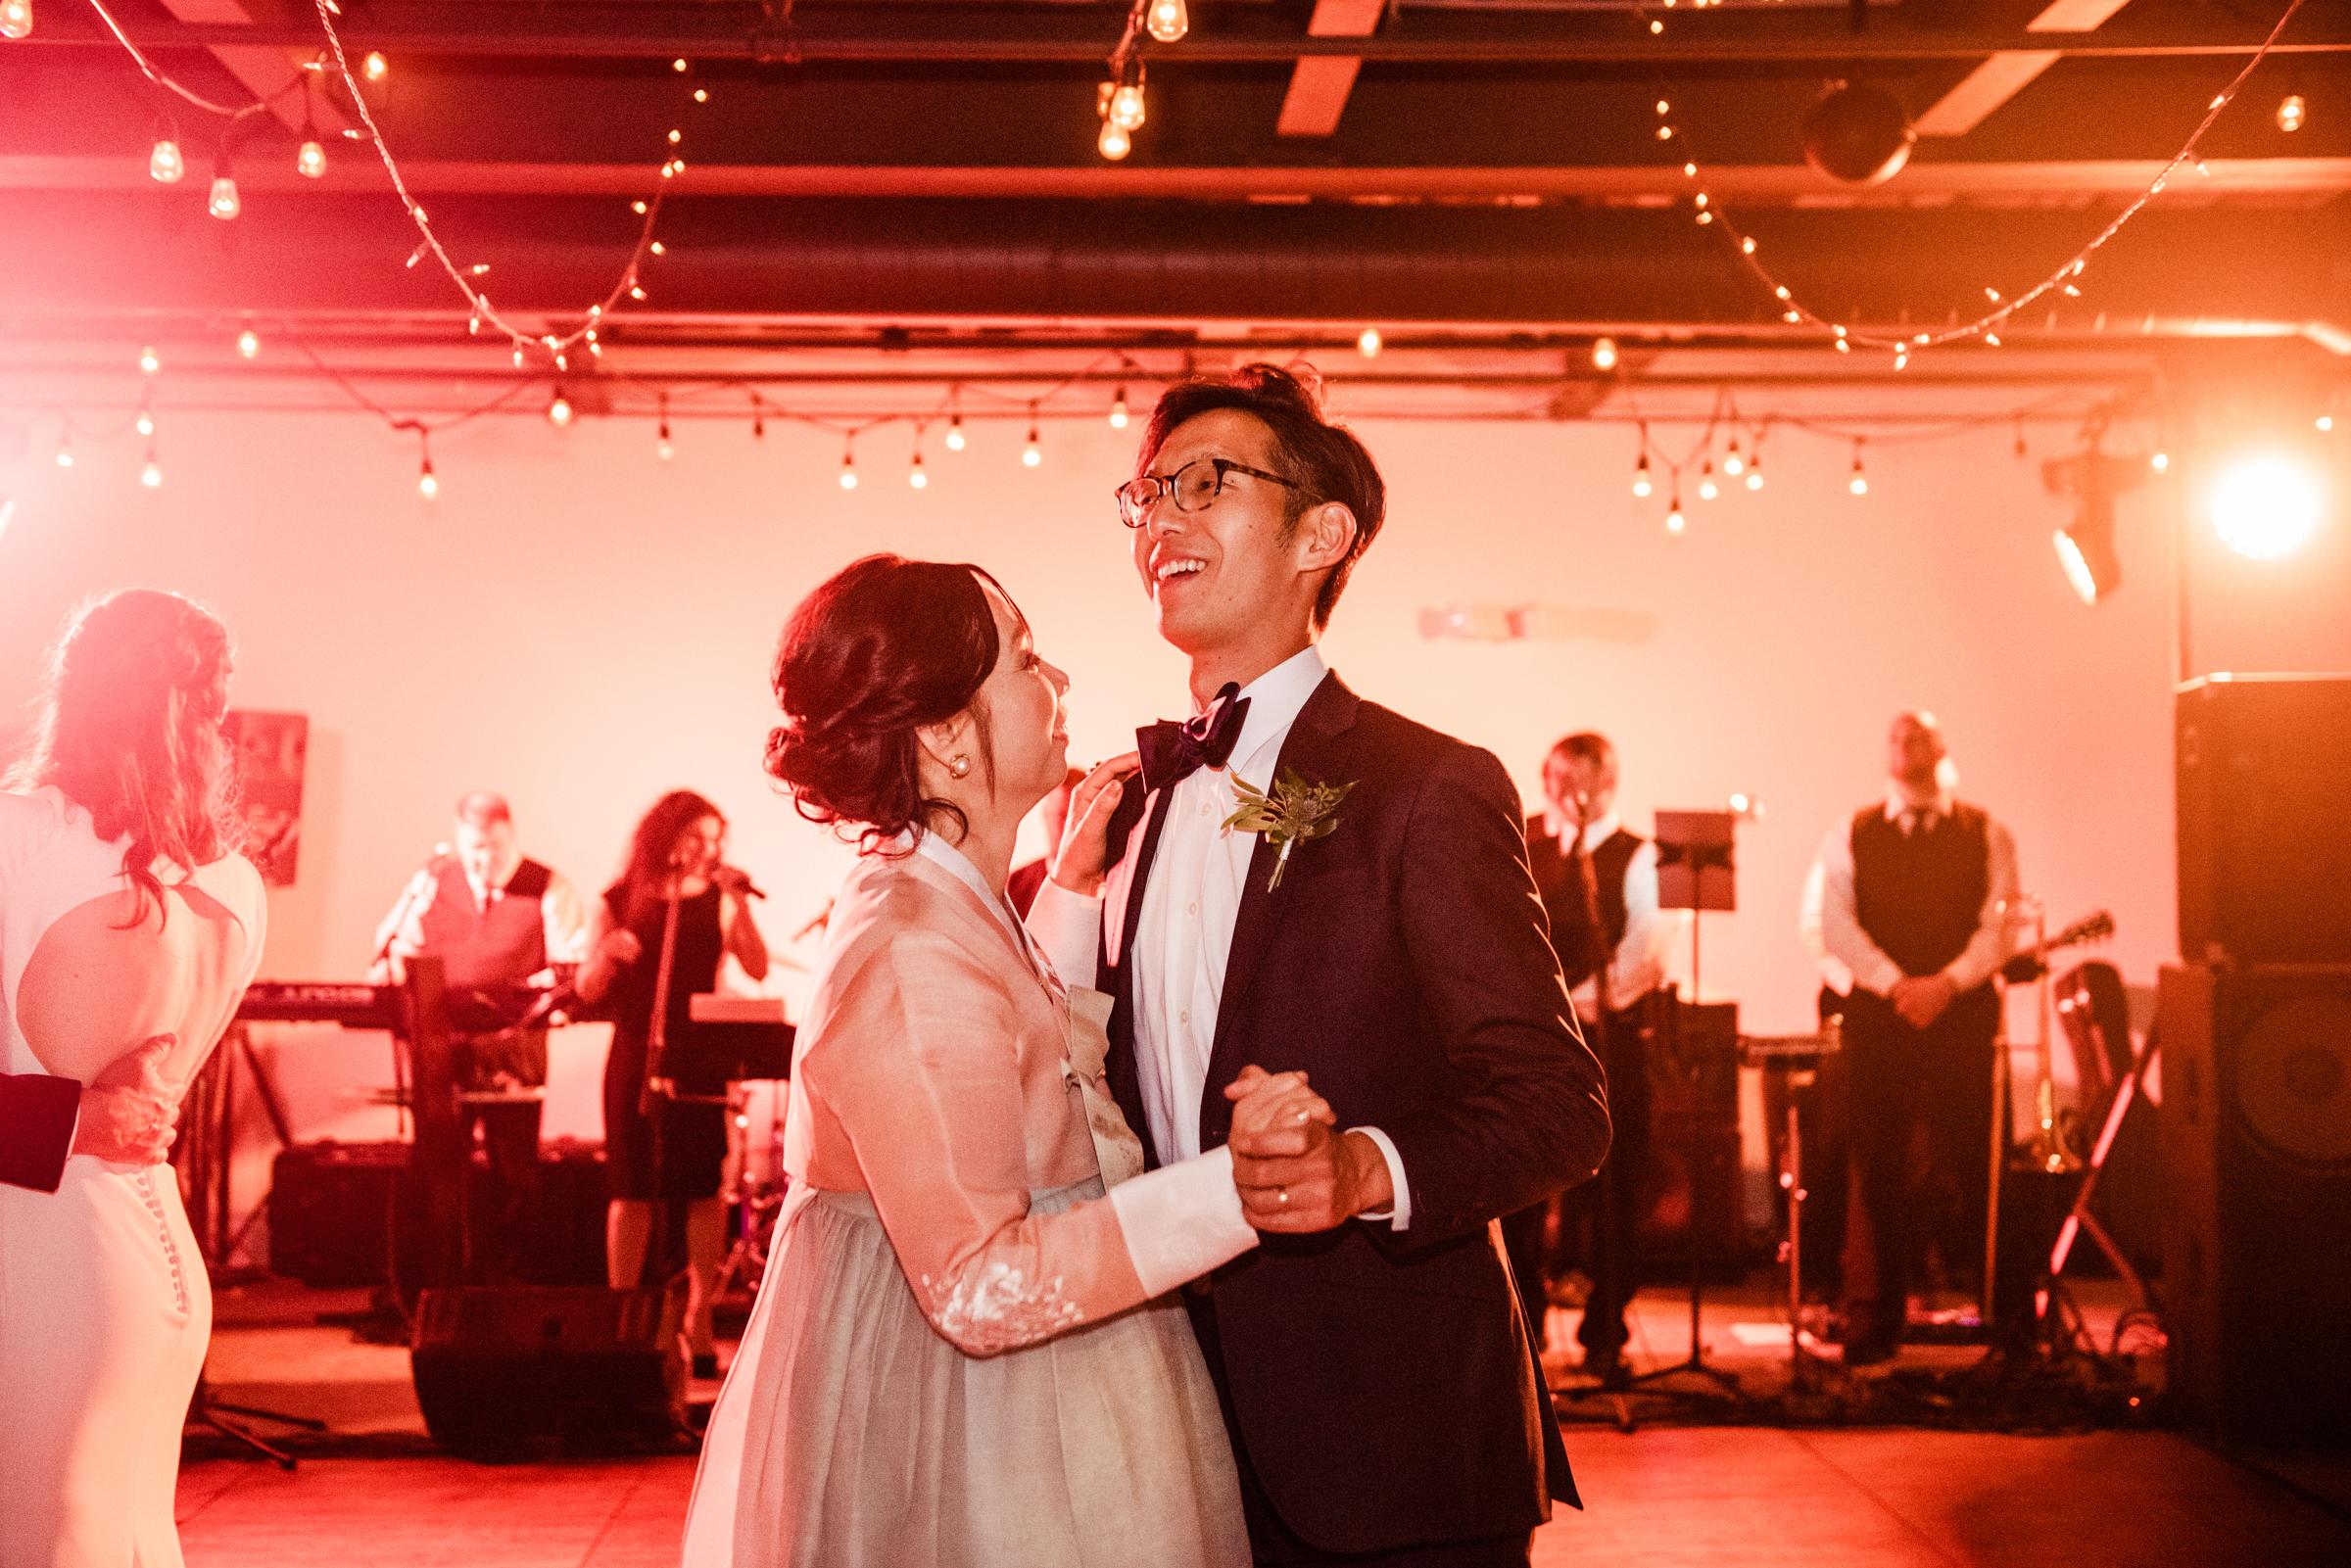 SKY_Armory_Syracuse_Wedding_JILL_STUDIO_Rochester_NY_Photographer_DSC_6451.jpg